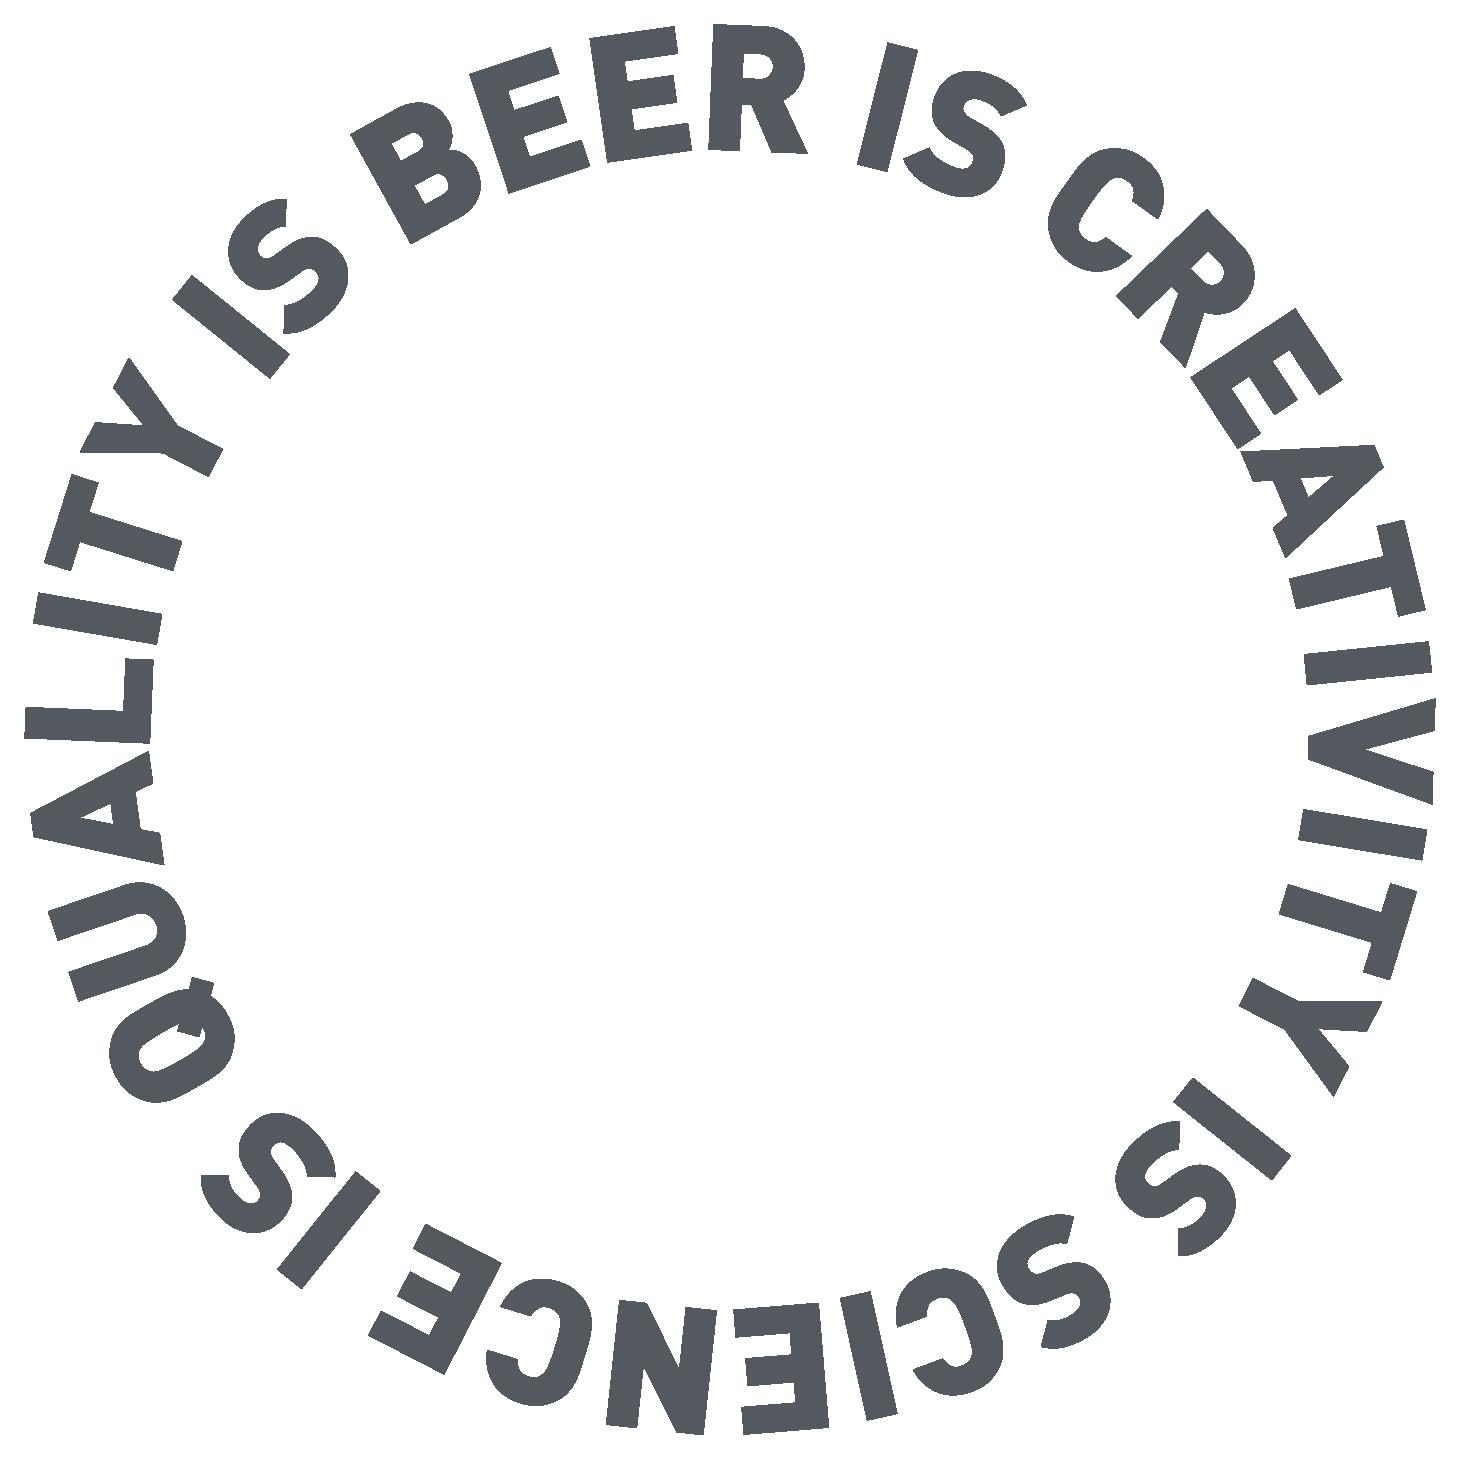 ingenious-brewing-company-Houston-texas